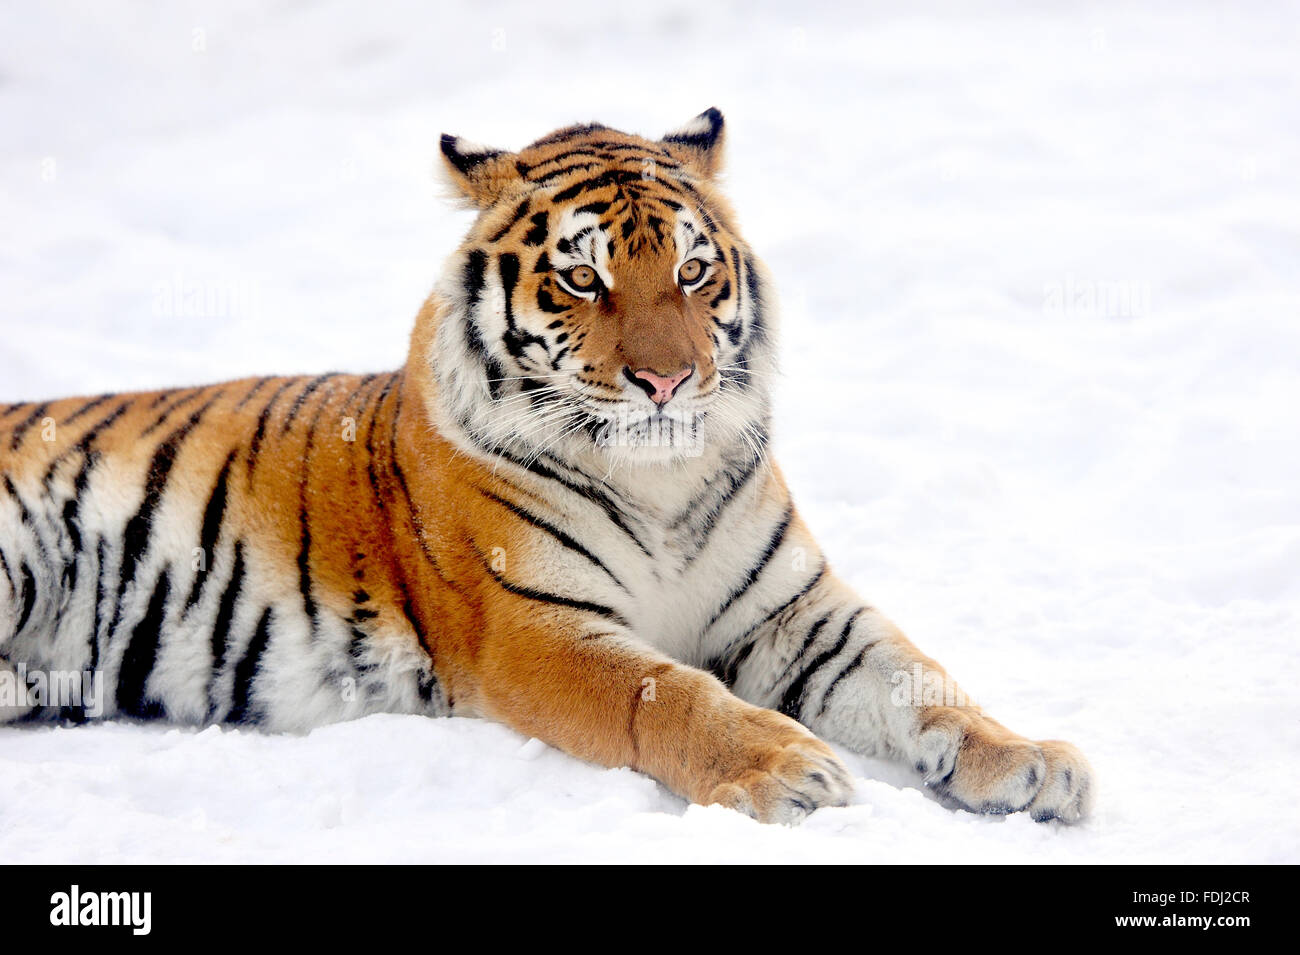 Hermoso tigre siberiano silvestres sobre la nieve Imagen De Stock